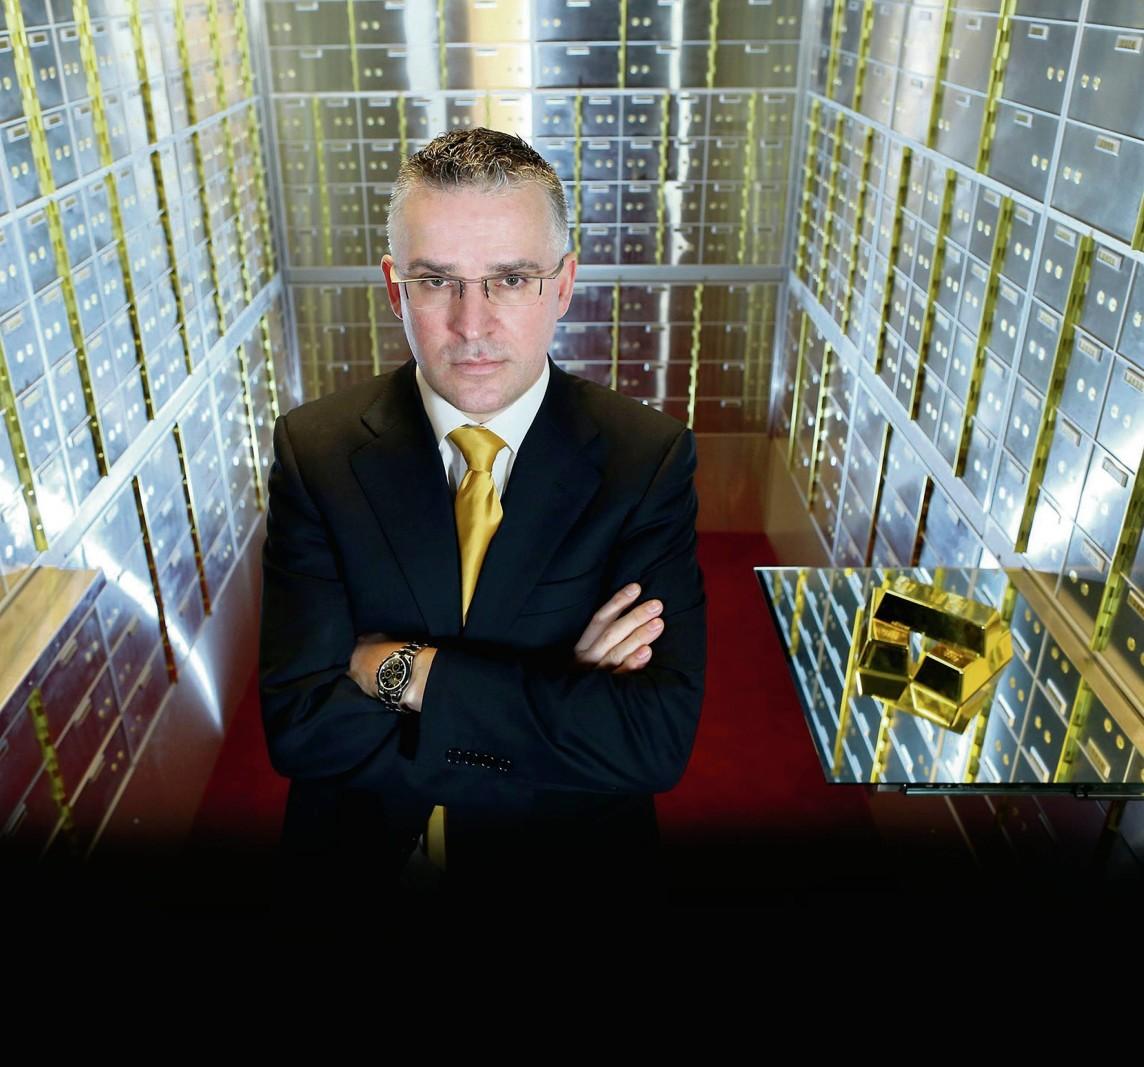 Safety-Deposit-Boxes-Dublin-Seamus-Fahy